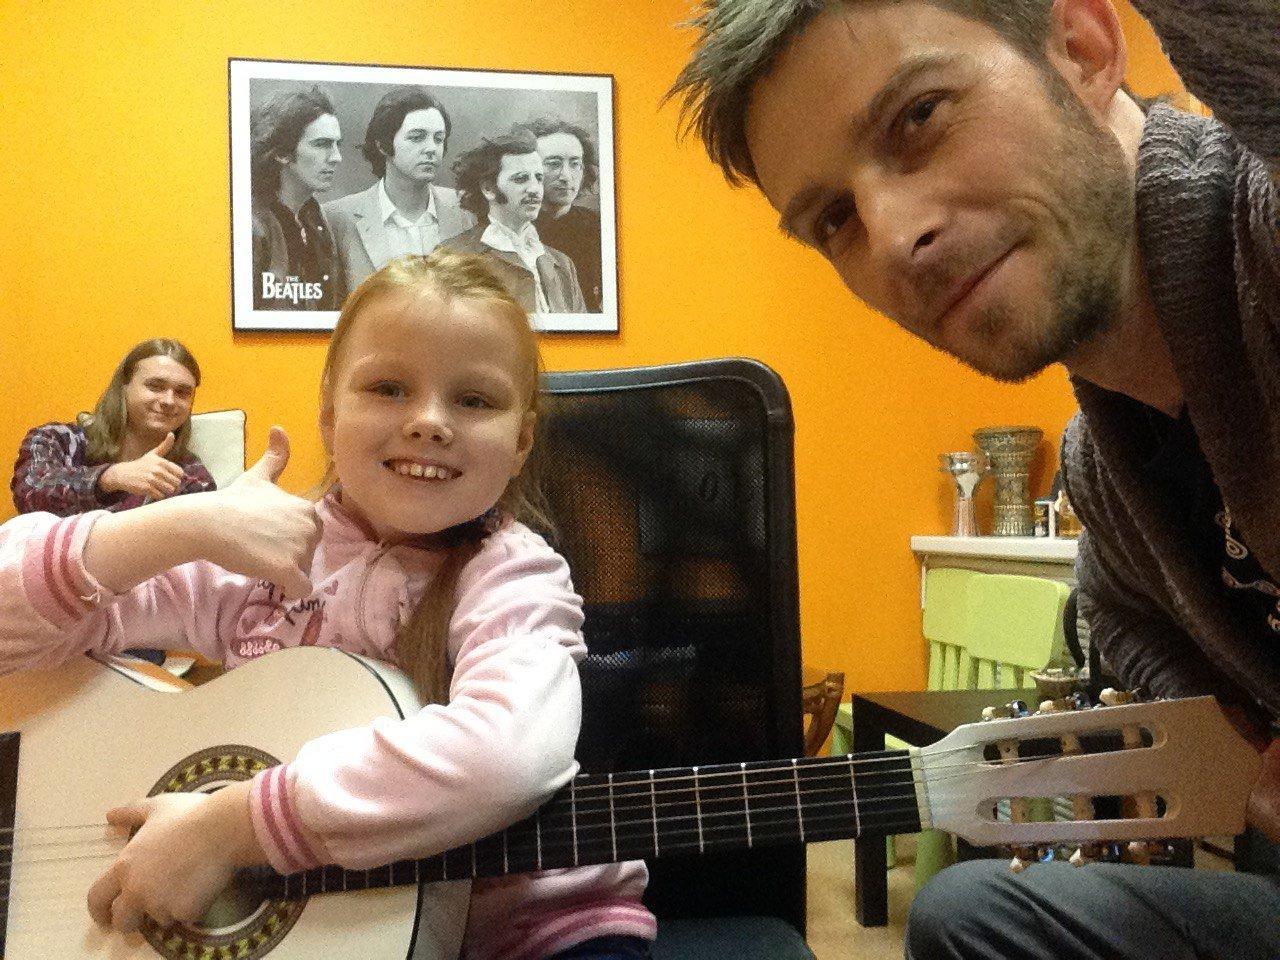 фотография Музыкальной школы Open Music